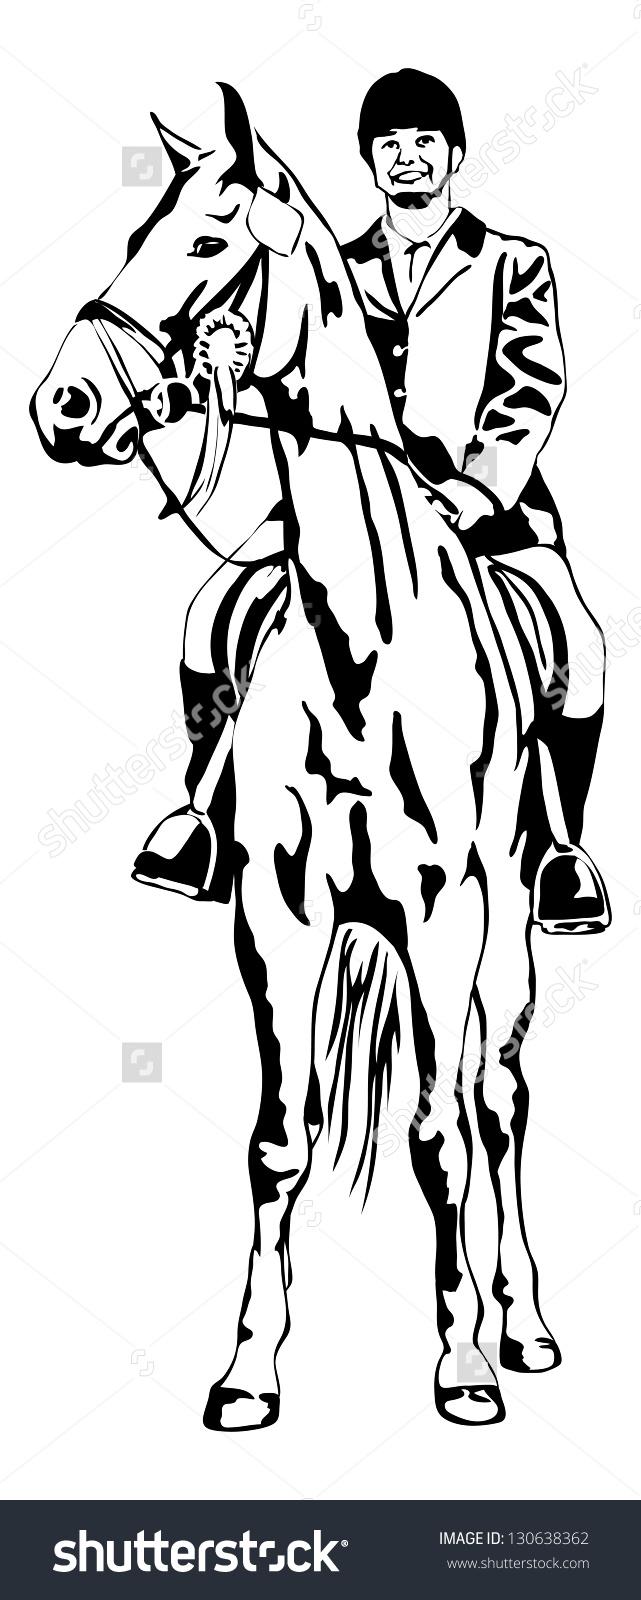 Pround Girl On Tournament Horse Stock Vector Illustration.